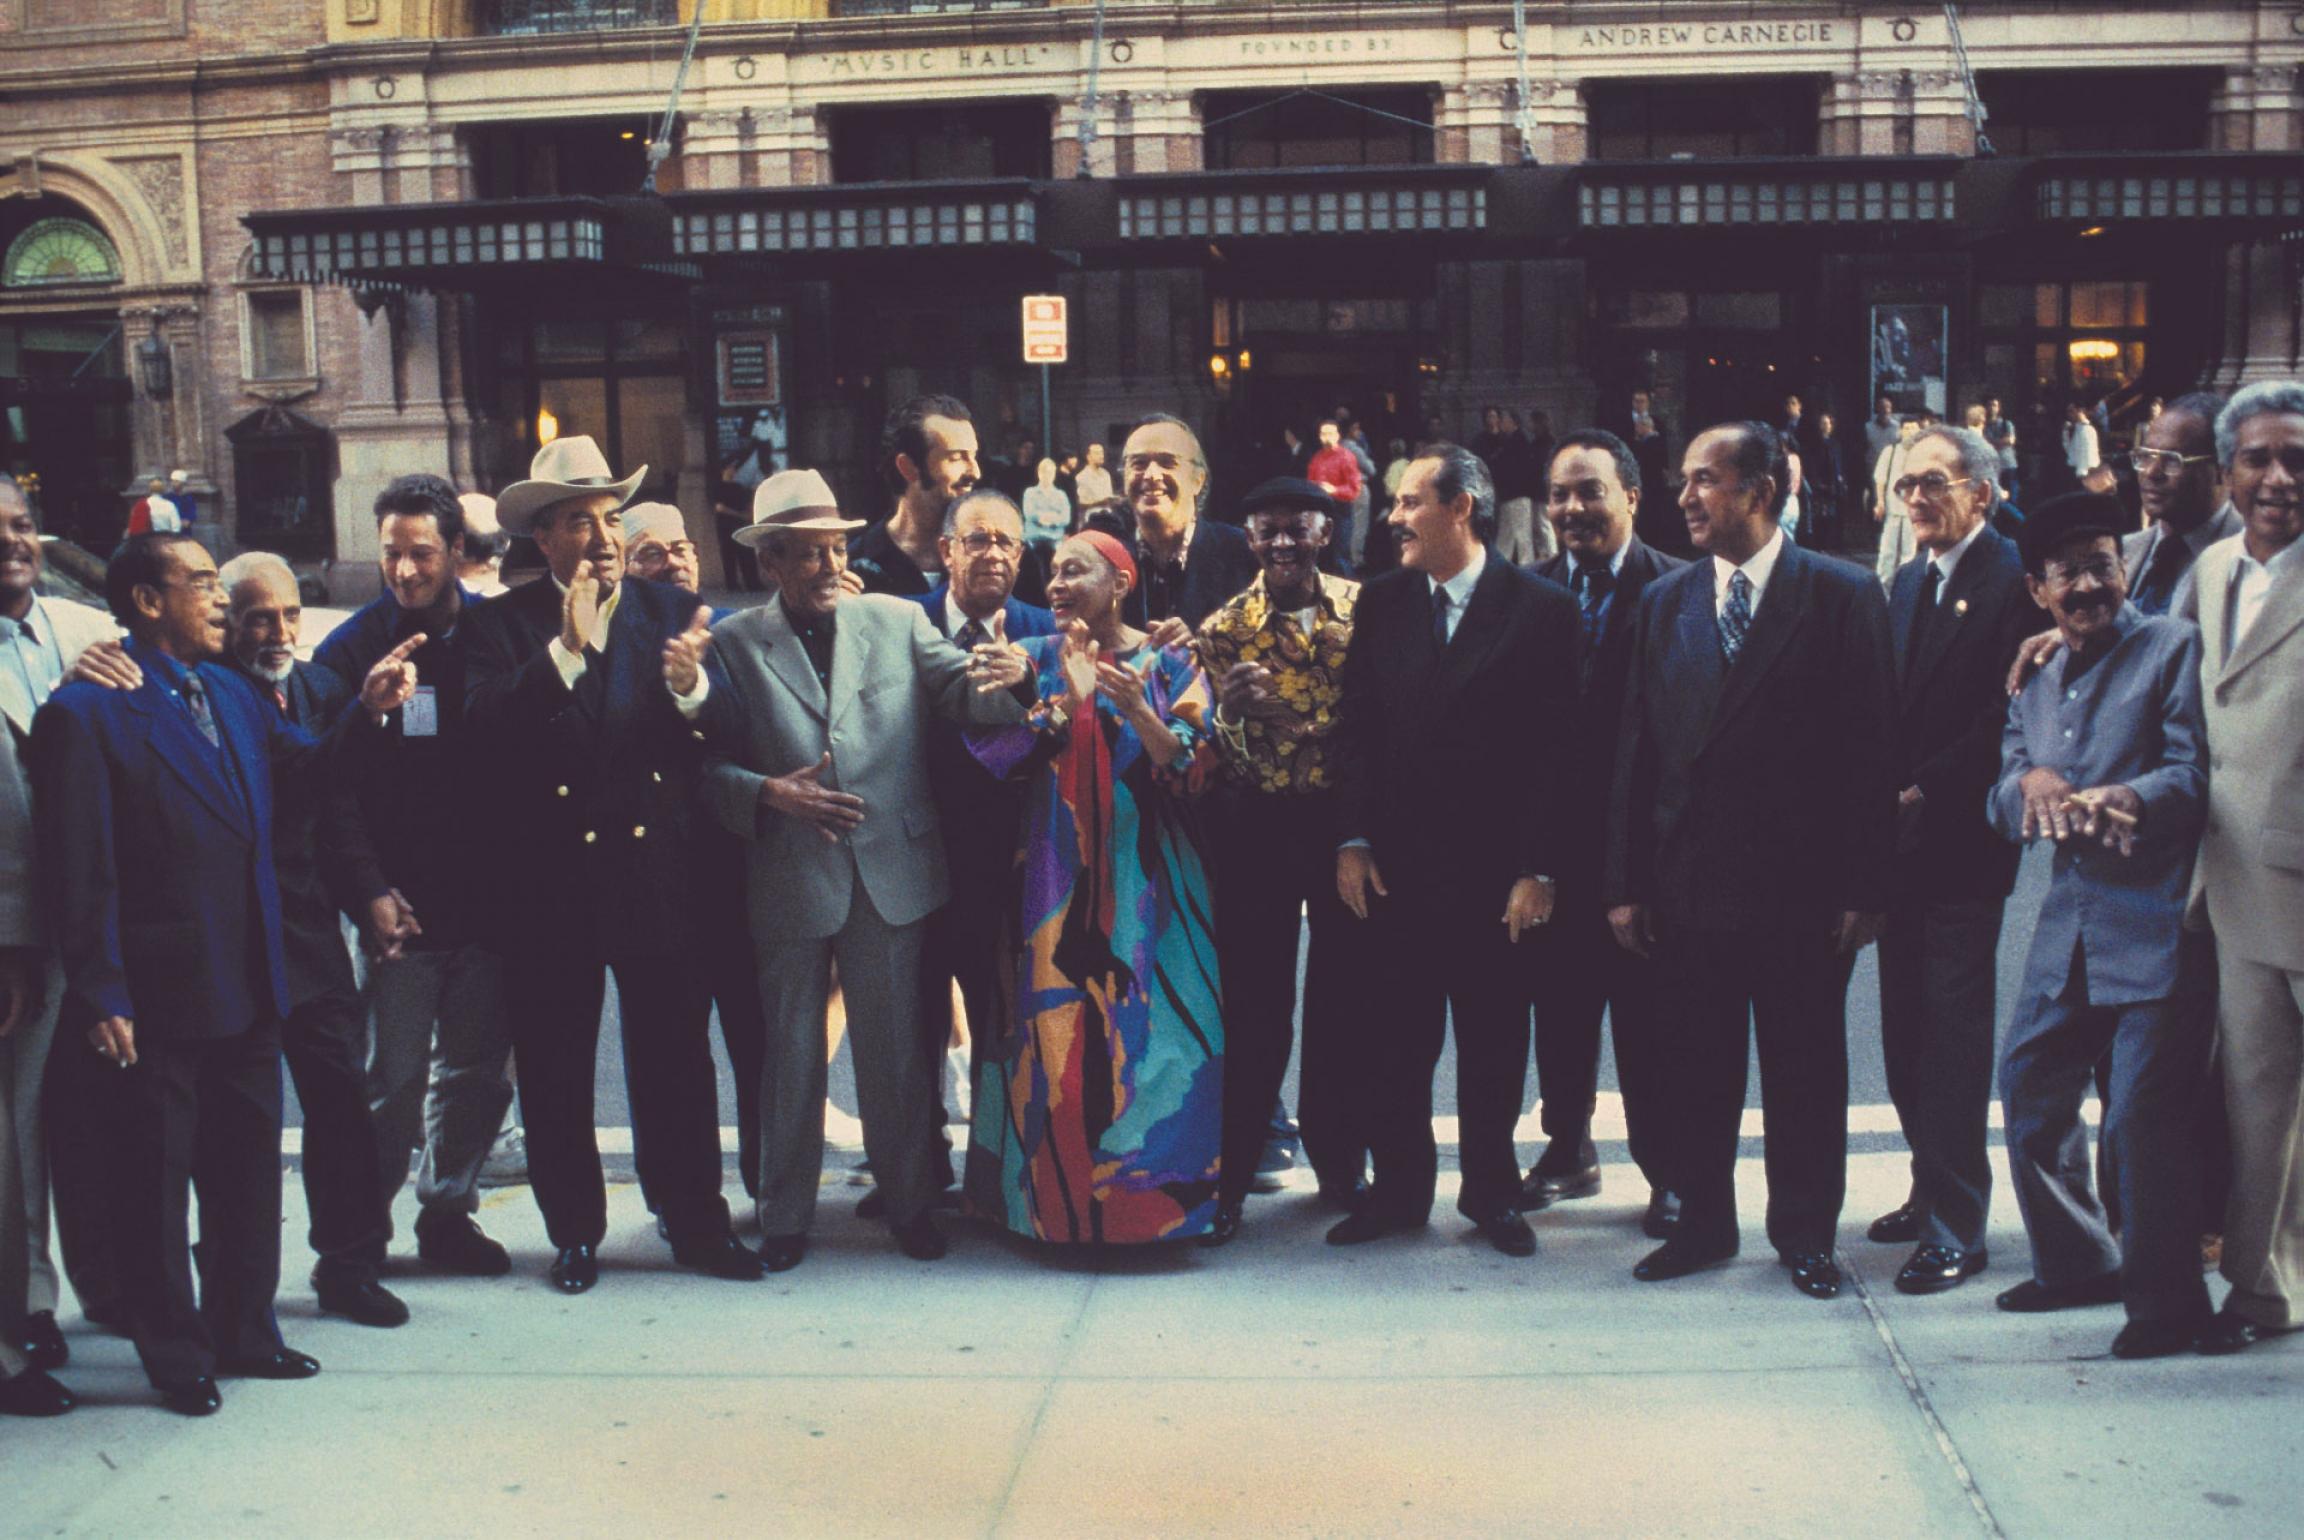 Buena Vista Social Club performs at Carnegie Hall in New York City, New York.